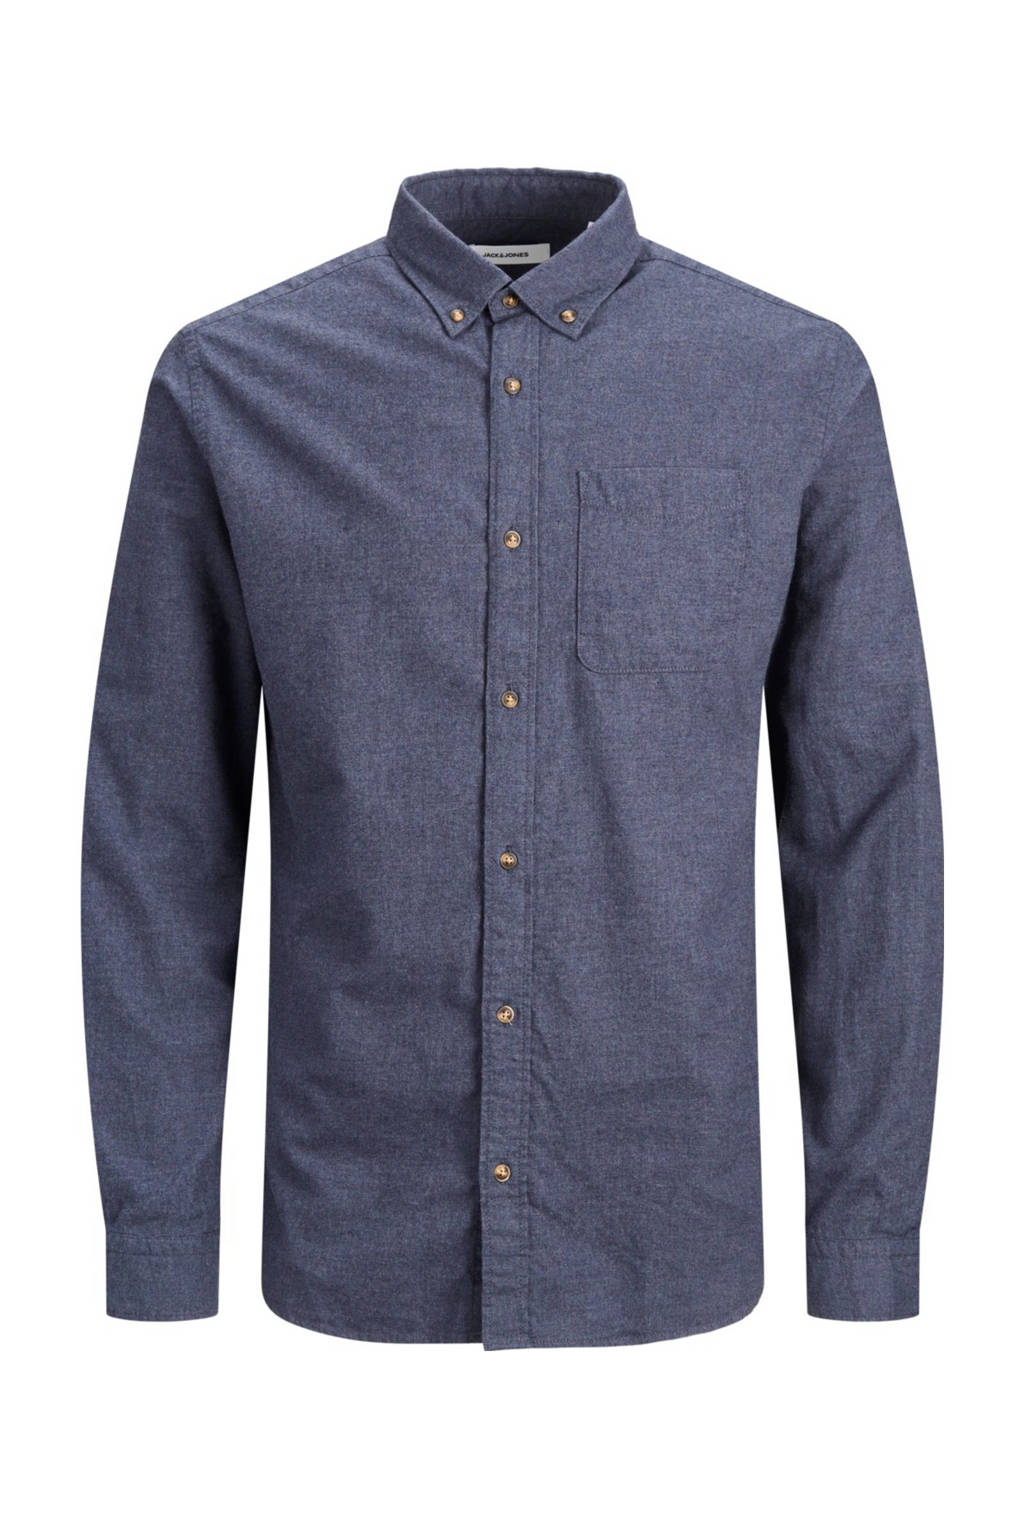 JACK & JONES PLUS SIZE gemêleerd regular fit overhemd donkerblauw, Donkerblauw